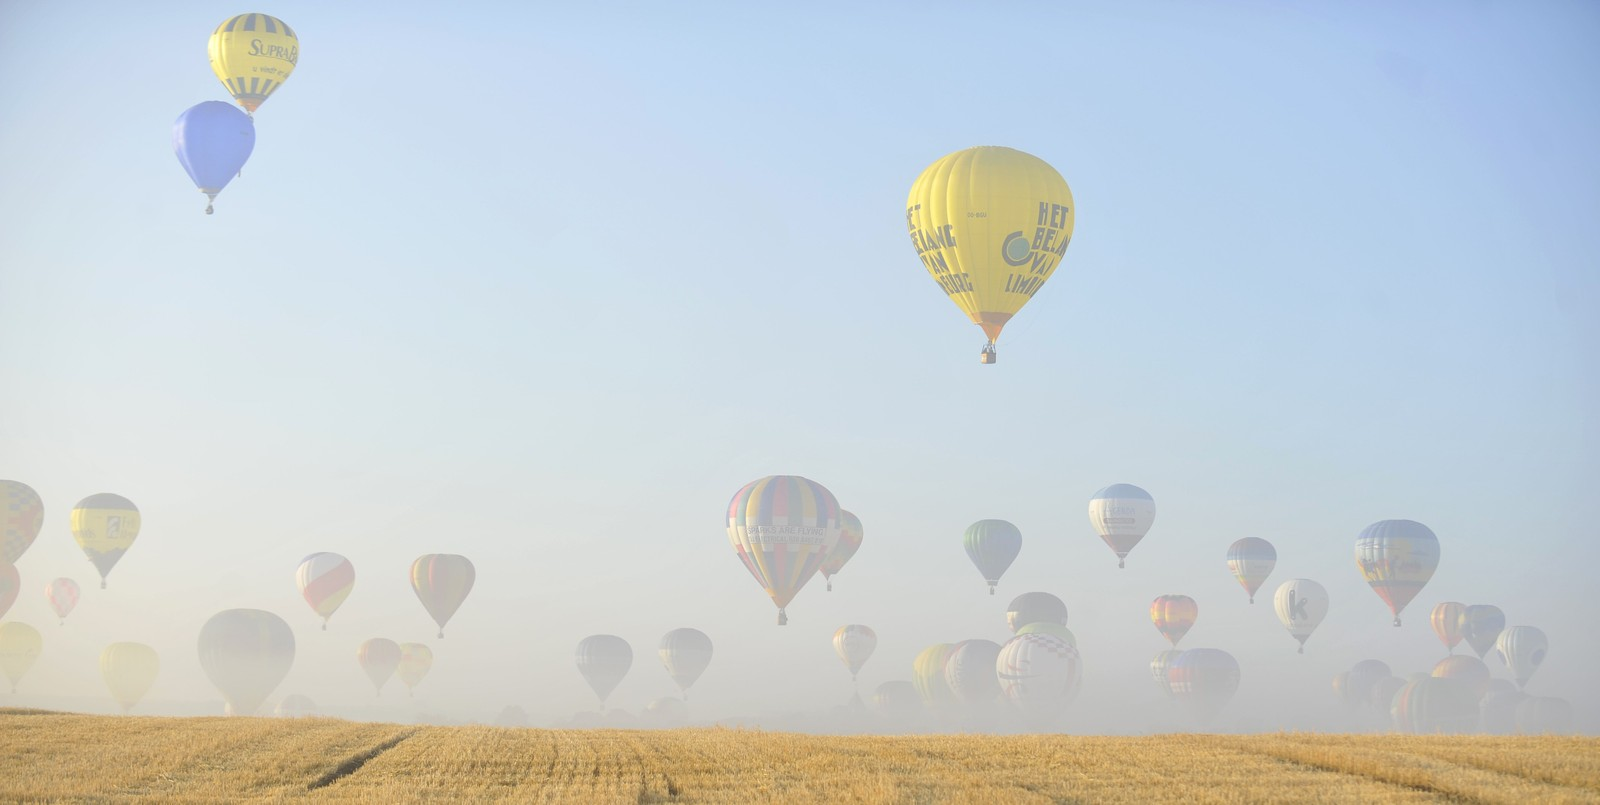 Varmluftsballonger over Chambley flybase, nordøst i Frankrike.